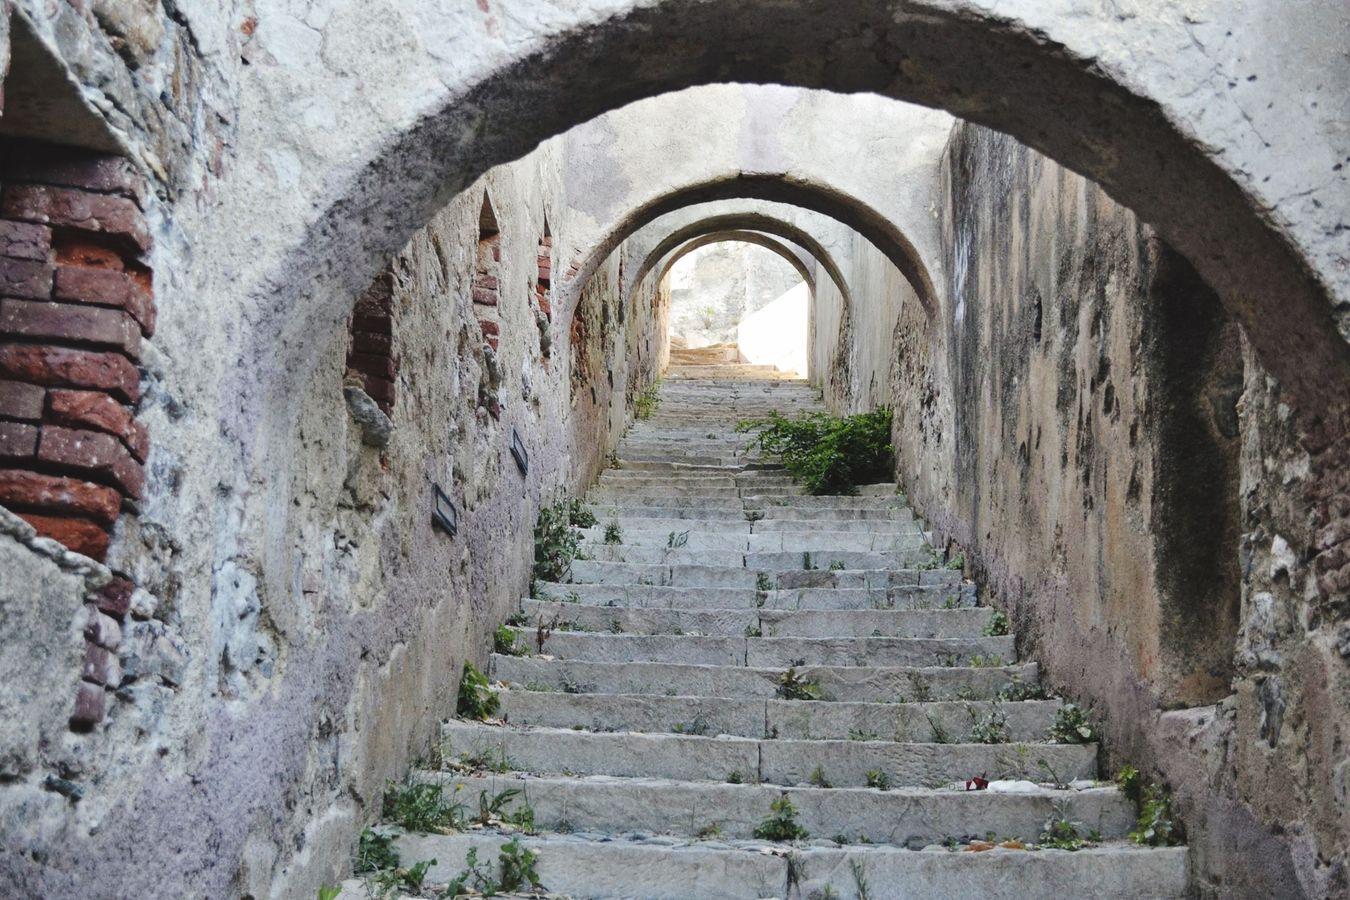 Bastia Vieux Bastia 2B Vieilles Pierres Original D'epoque Escaliers Petits Arches NikonD3100